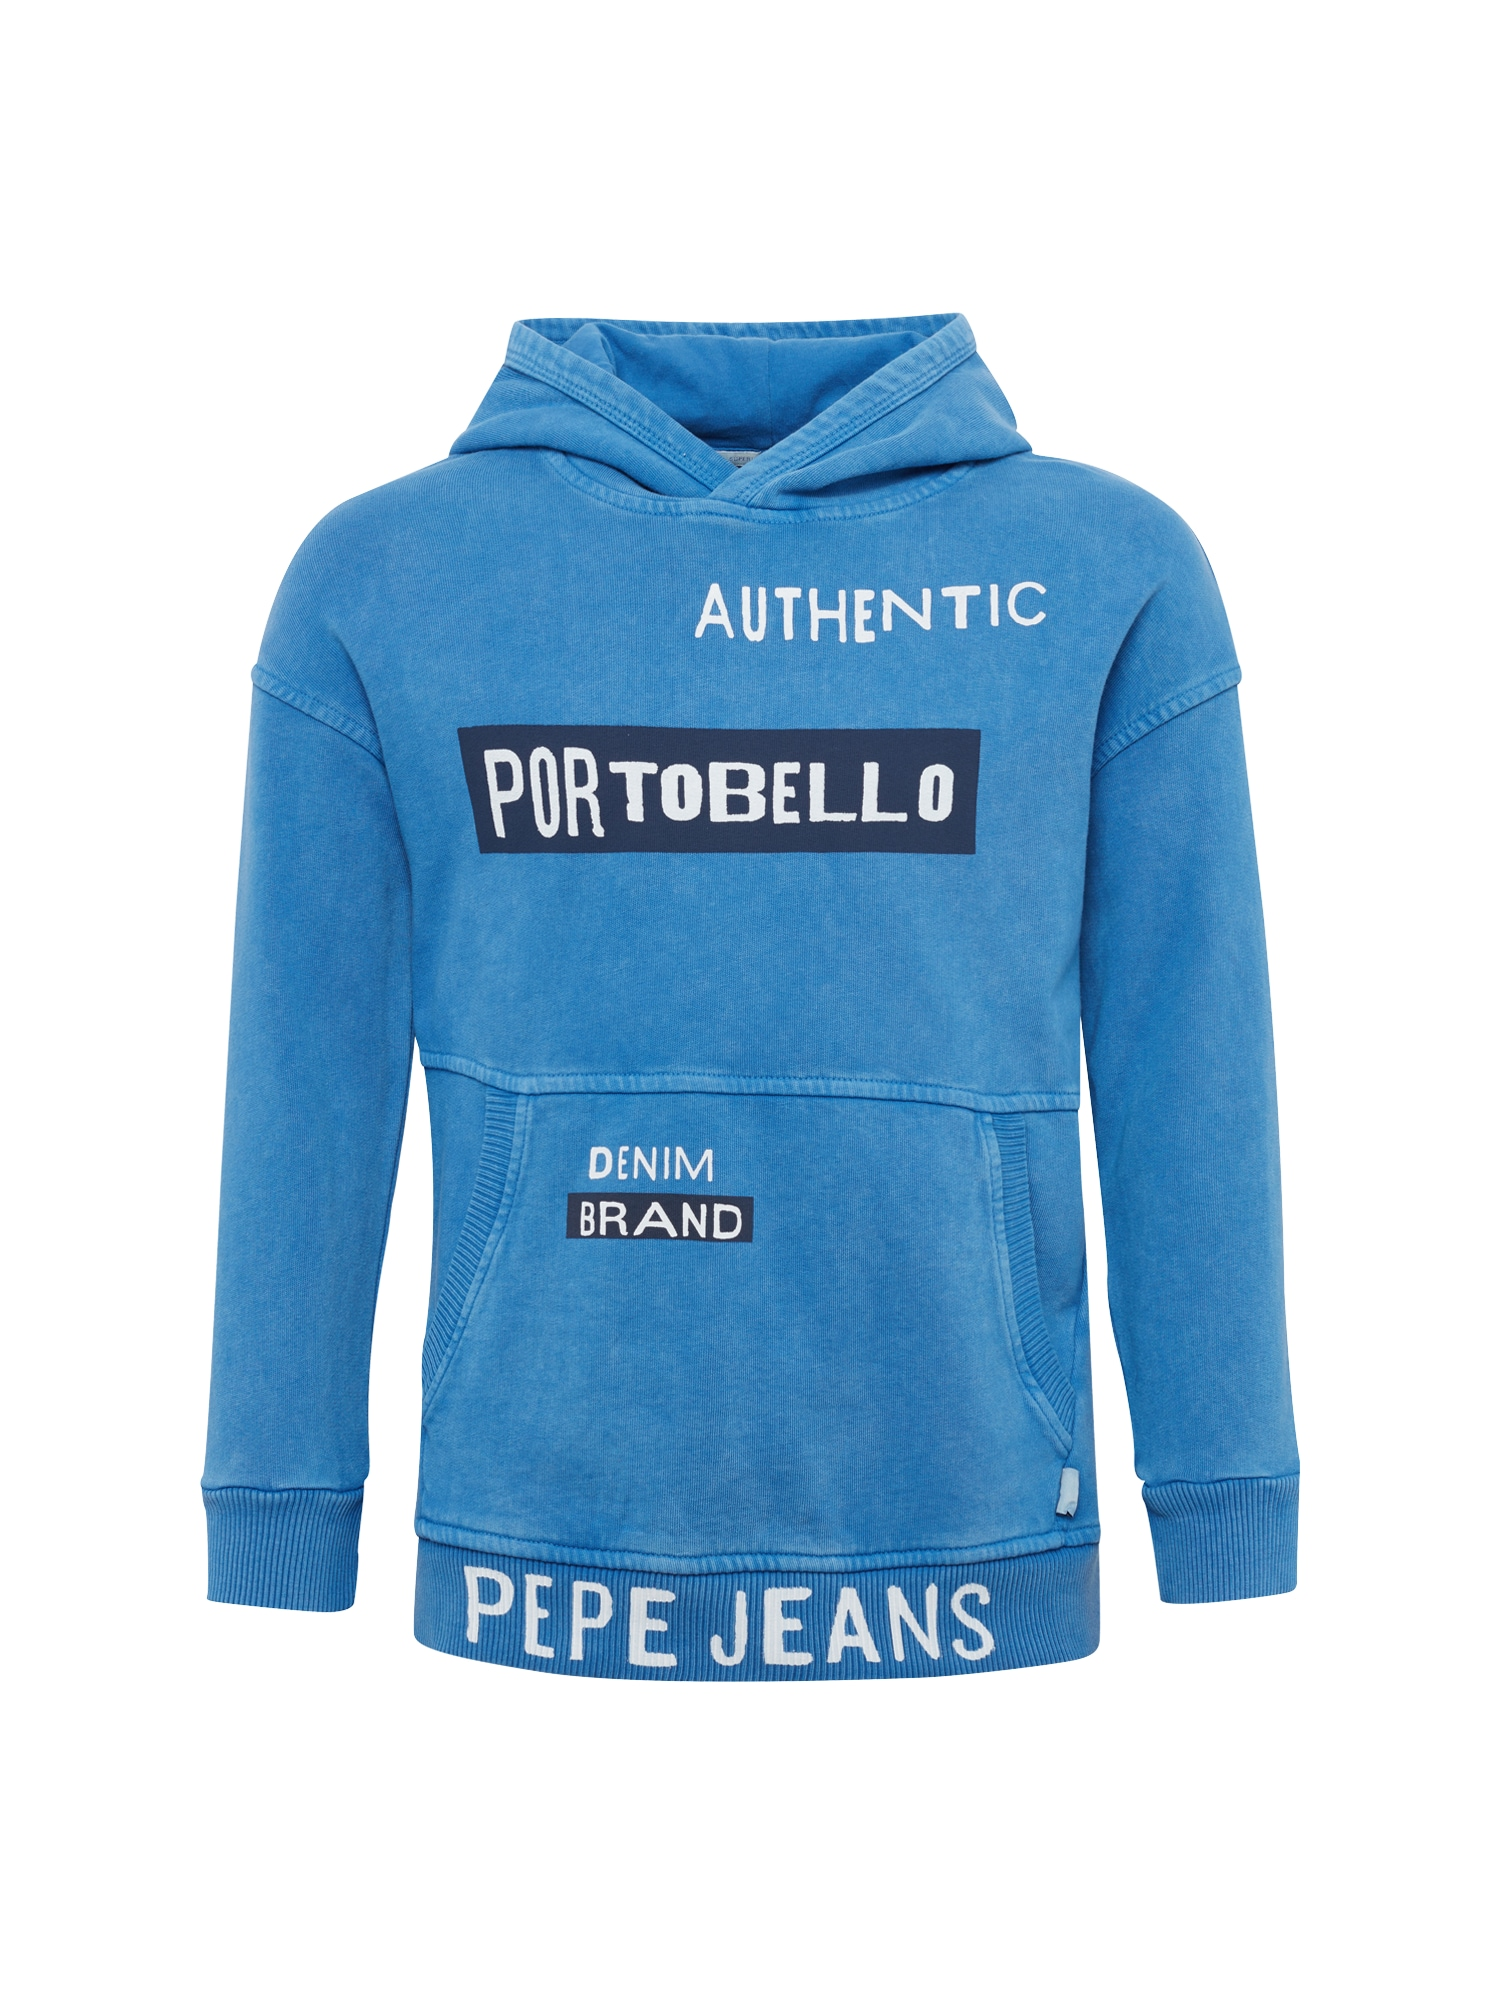 Pepe Jeans Jongens Sweatshirt SIM JR royal blue koningsblauw